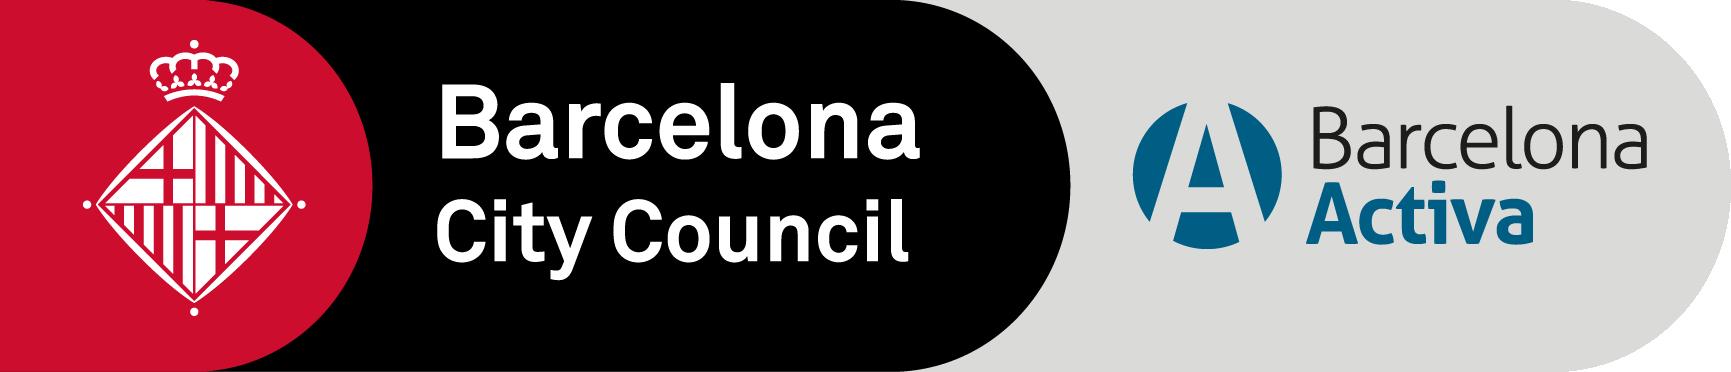 Barcelona City Council